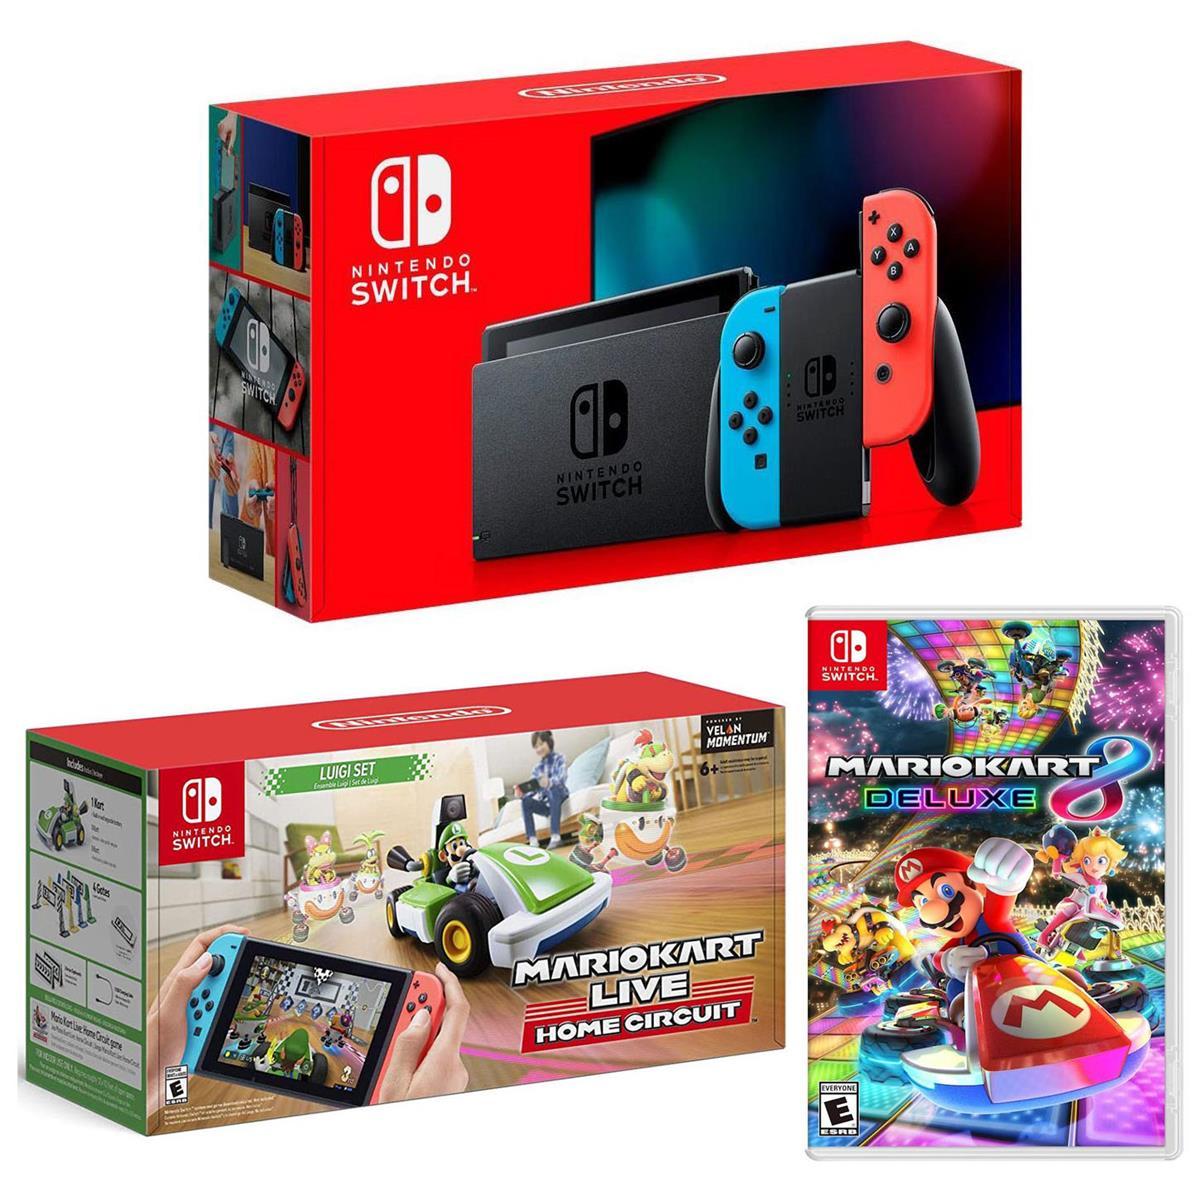 Nintendo 32GB Nintendo Switch with Neon Blue & Neon Red Joy-Con Controllers - Bundle With Nintendo Mario Kart Live: Home Circuit Luigi Set for Nintendo Switch, Mario Kart 8 Deluxe for Nintendo Switch